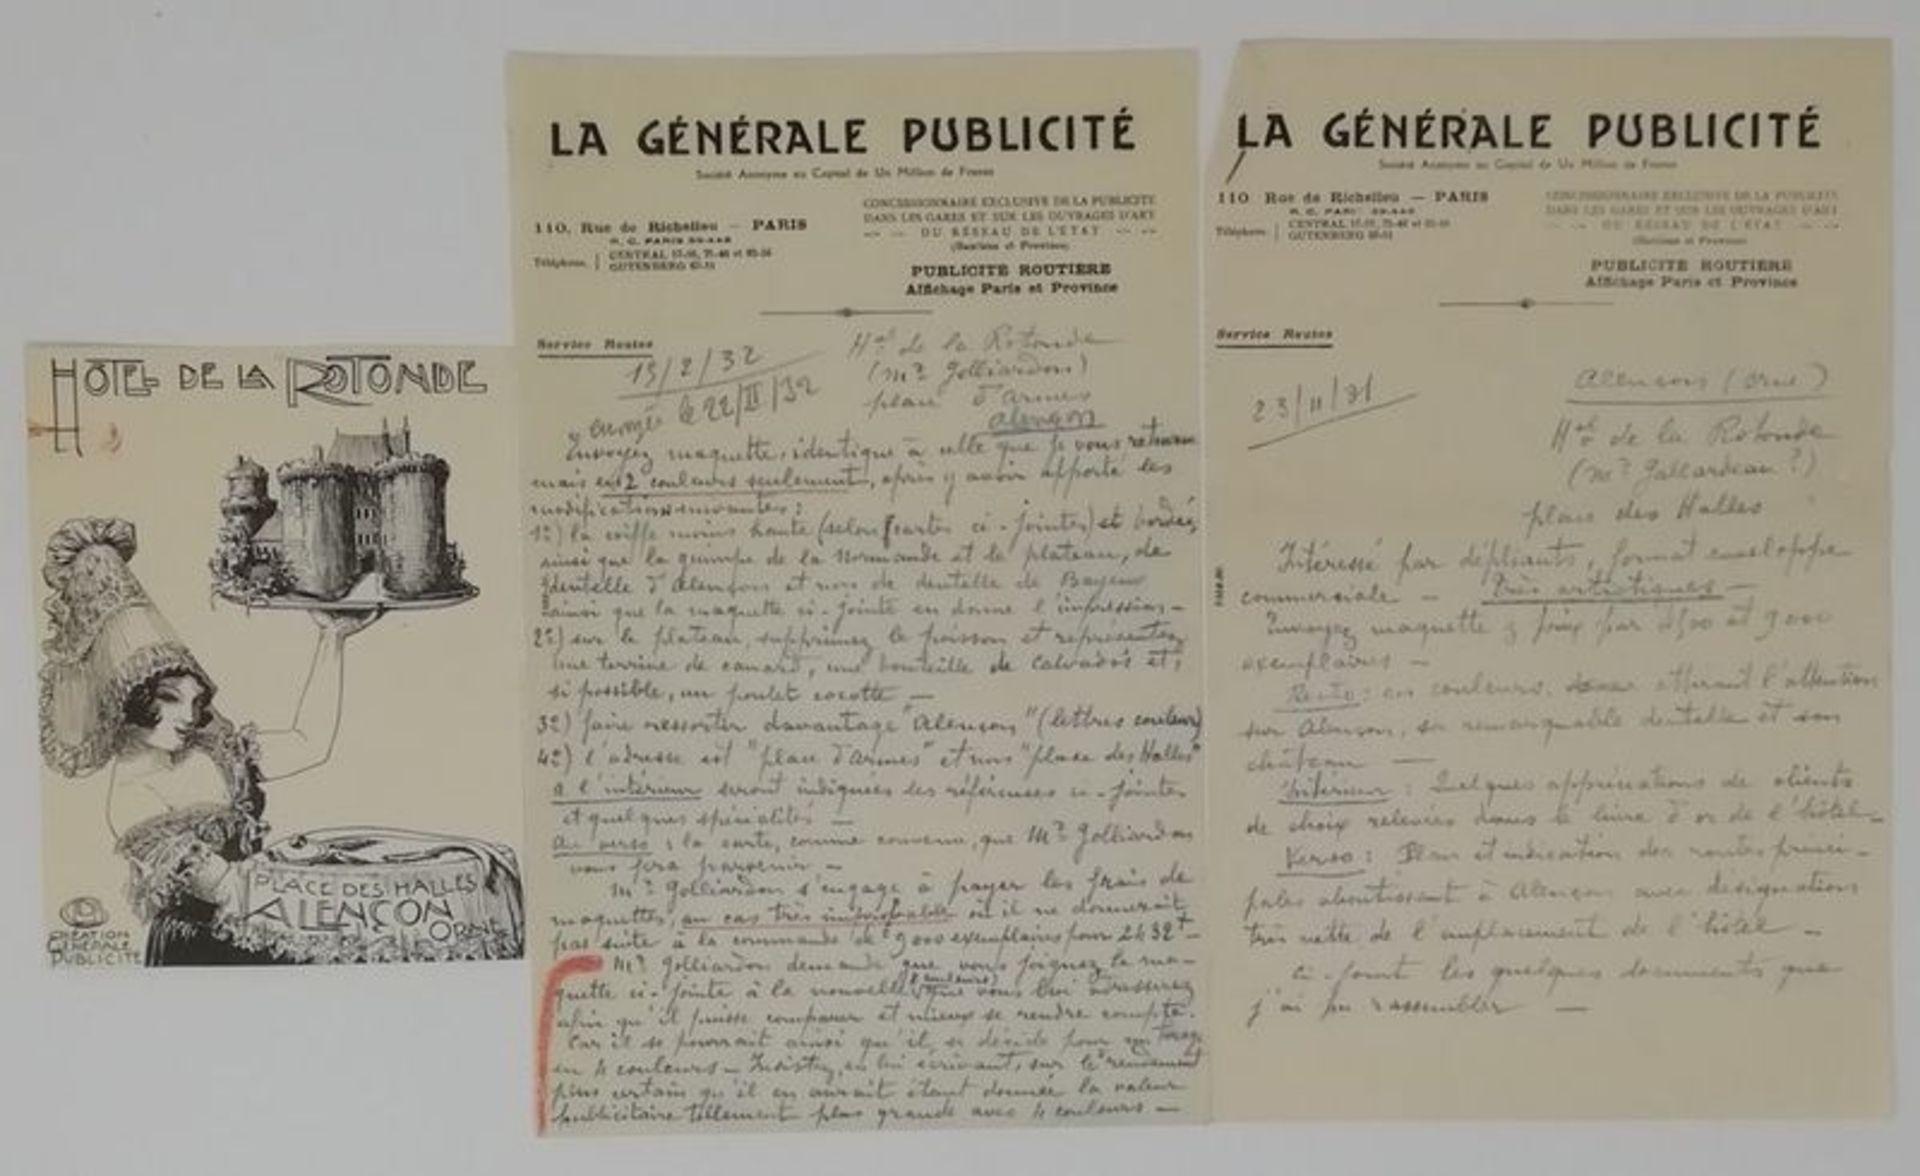 Charles-Léonce Brossé (1871 - ?) Advertising projects, menus, original drawings [...] - Bild 3 aus 4